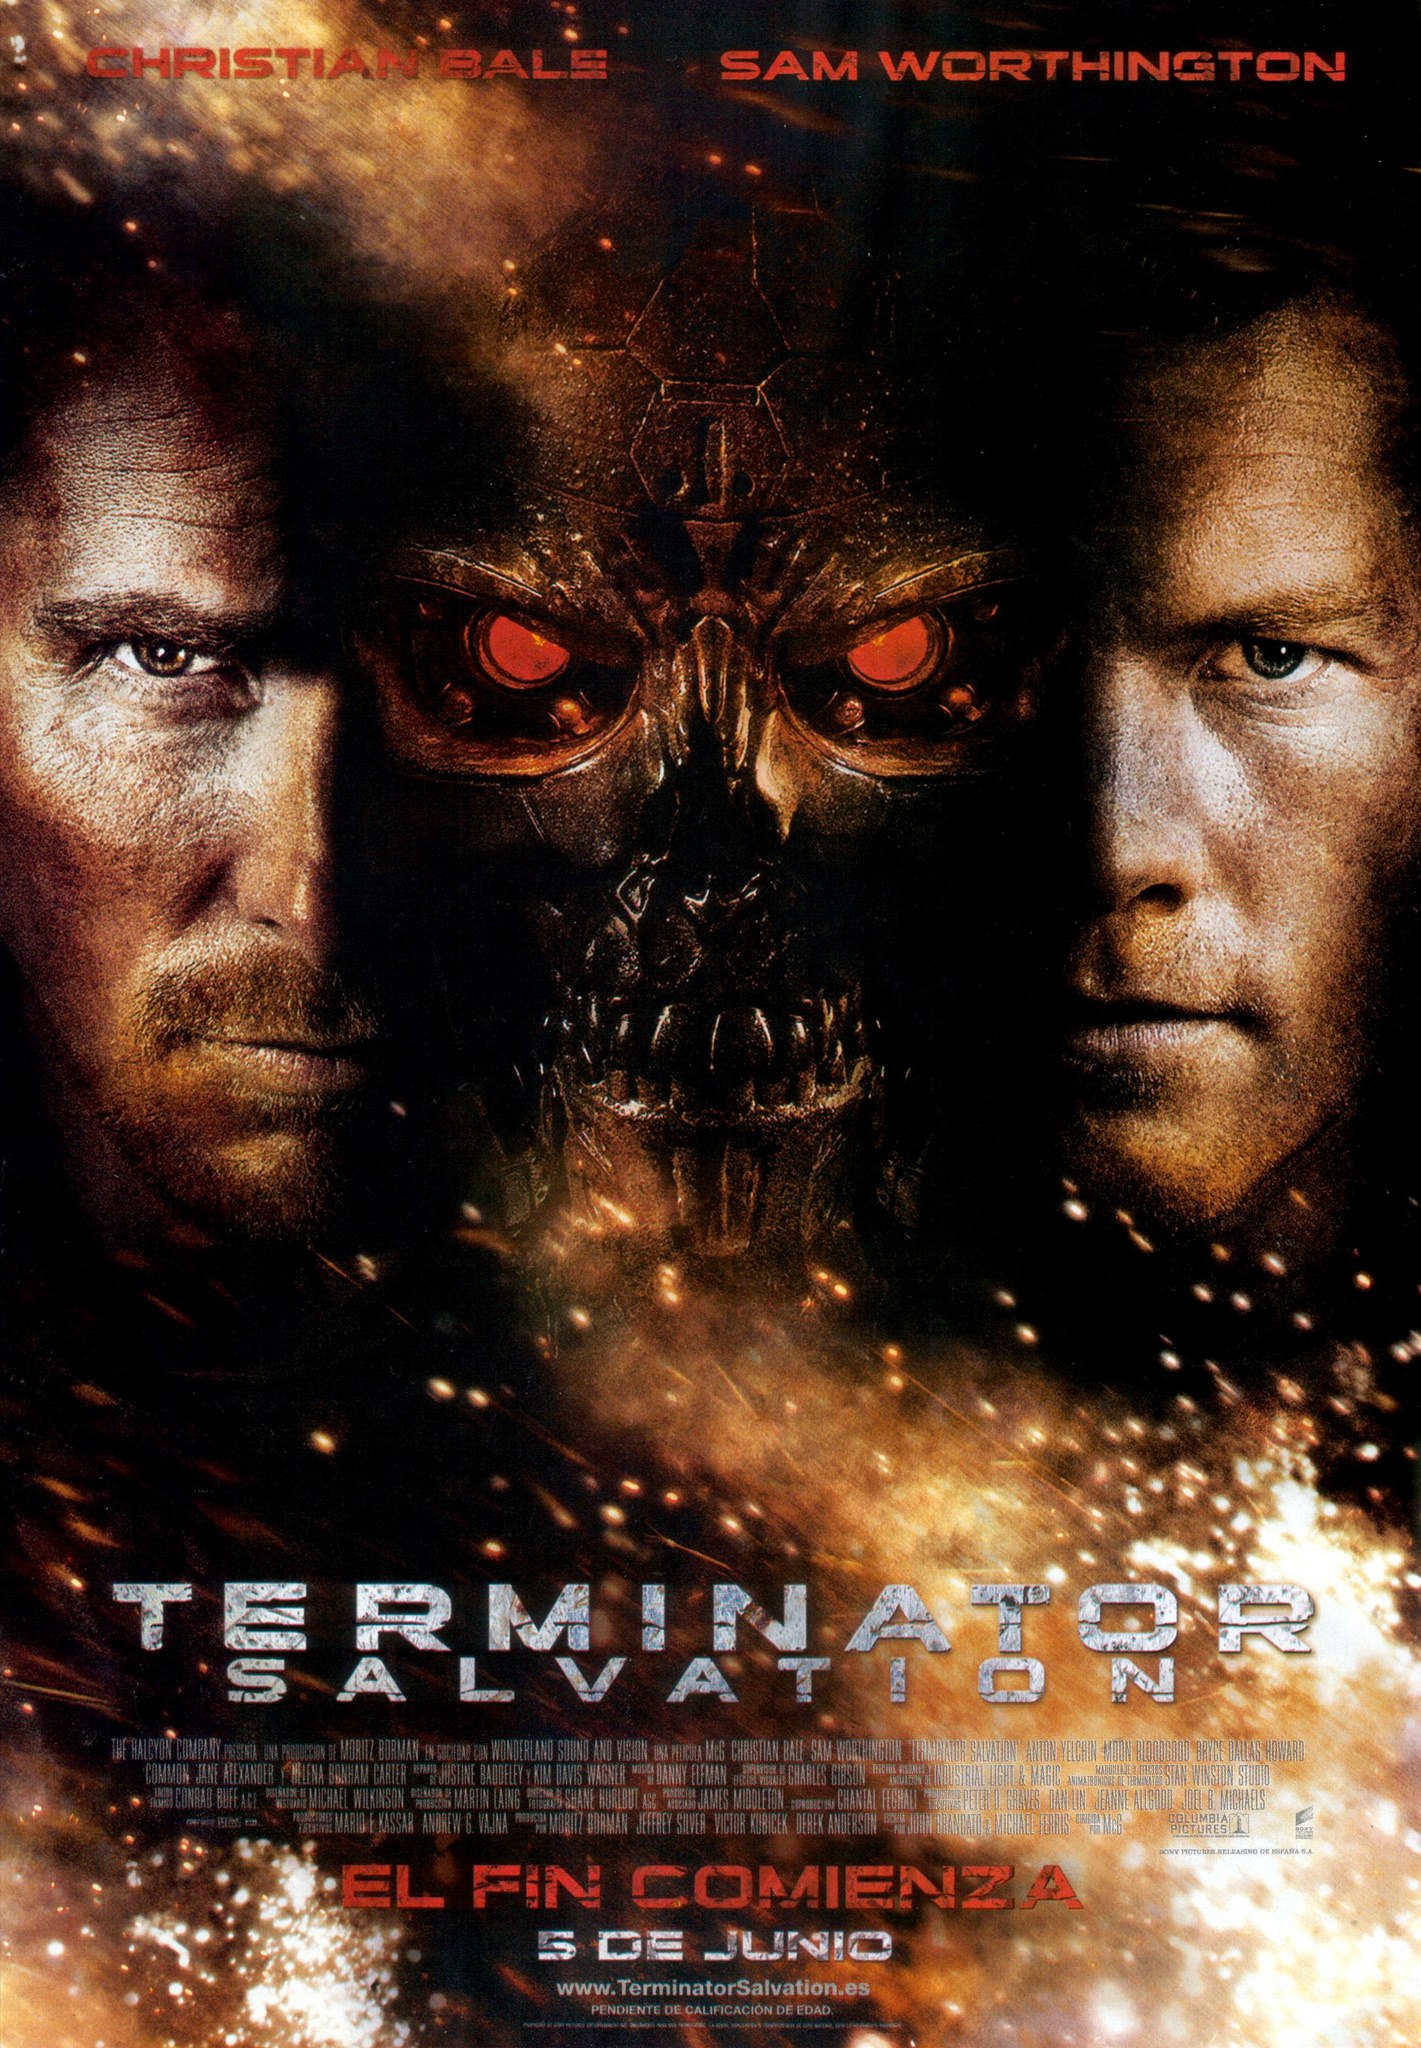 Terminator salvation wikia terminator fandom powered by wikia terminator salvation thecheapjerseys Gallery